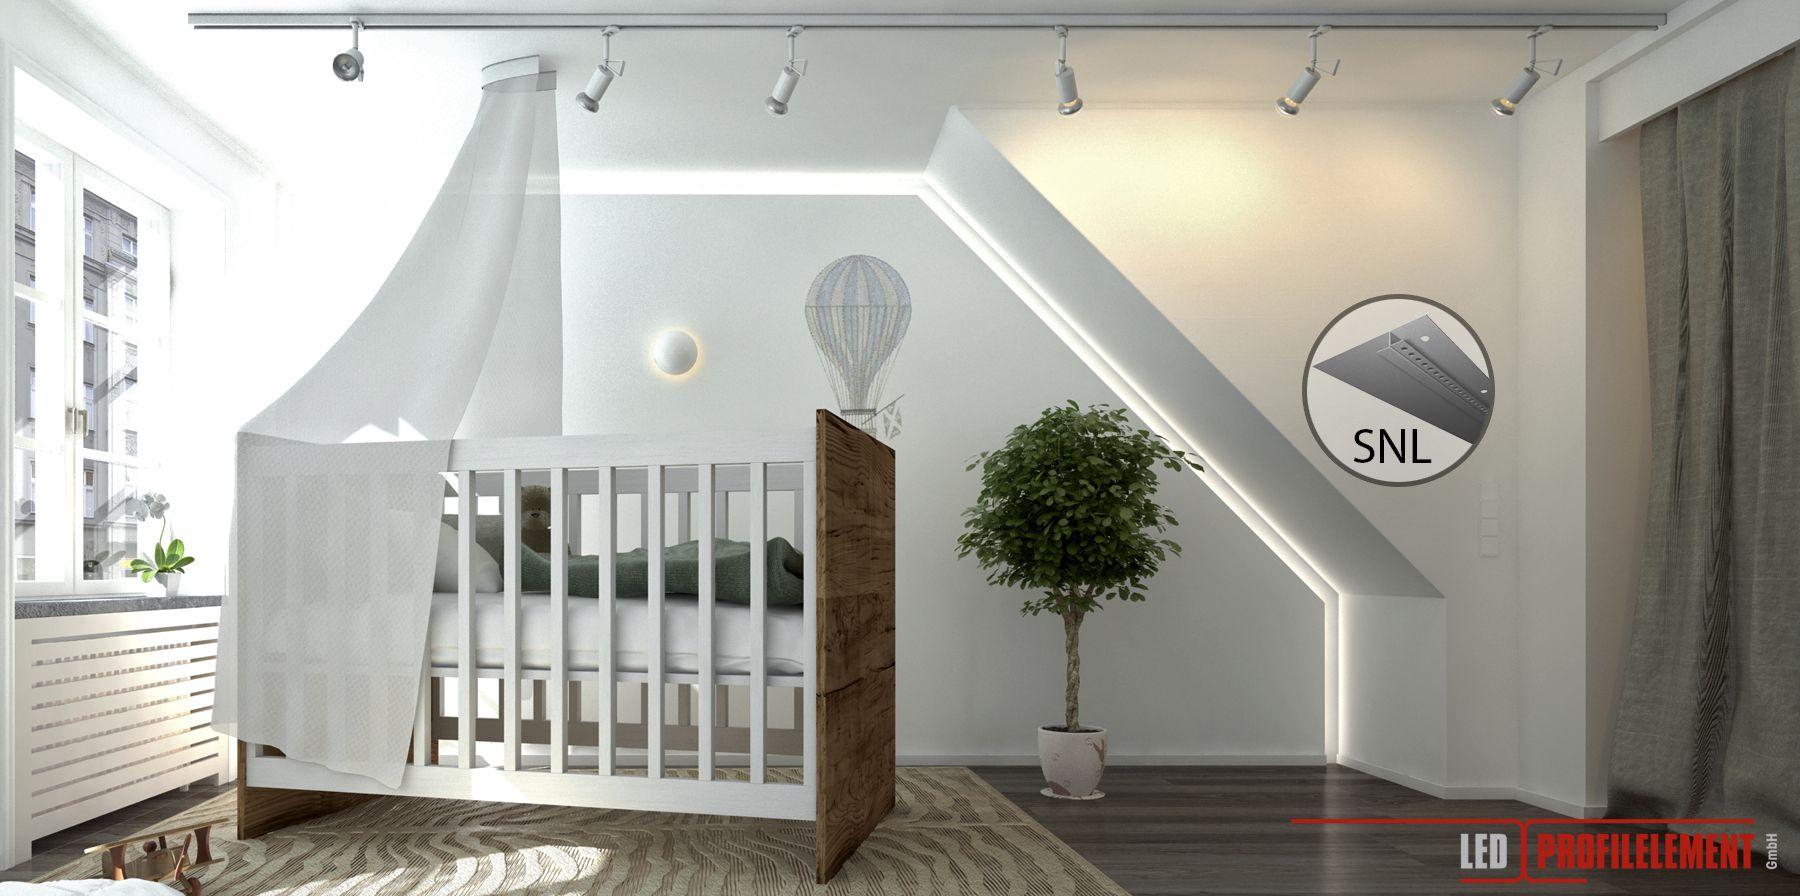 Kinderzimmer Mit Indirekter Beleuchtung Www Ledprofilelement De Indirekte Beleuchtung Beleuchtung Led